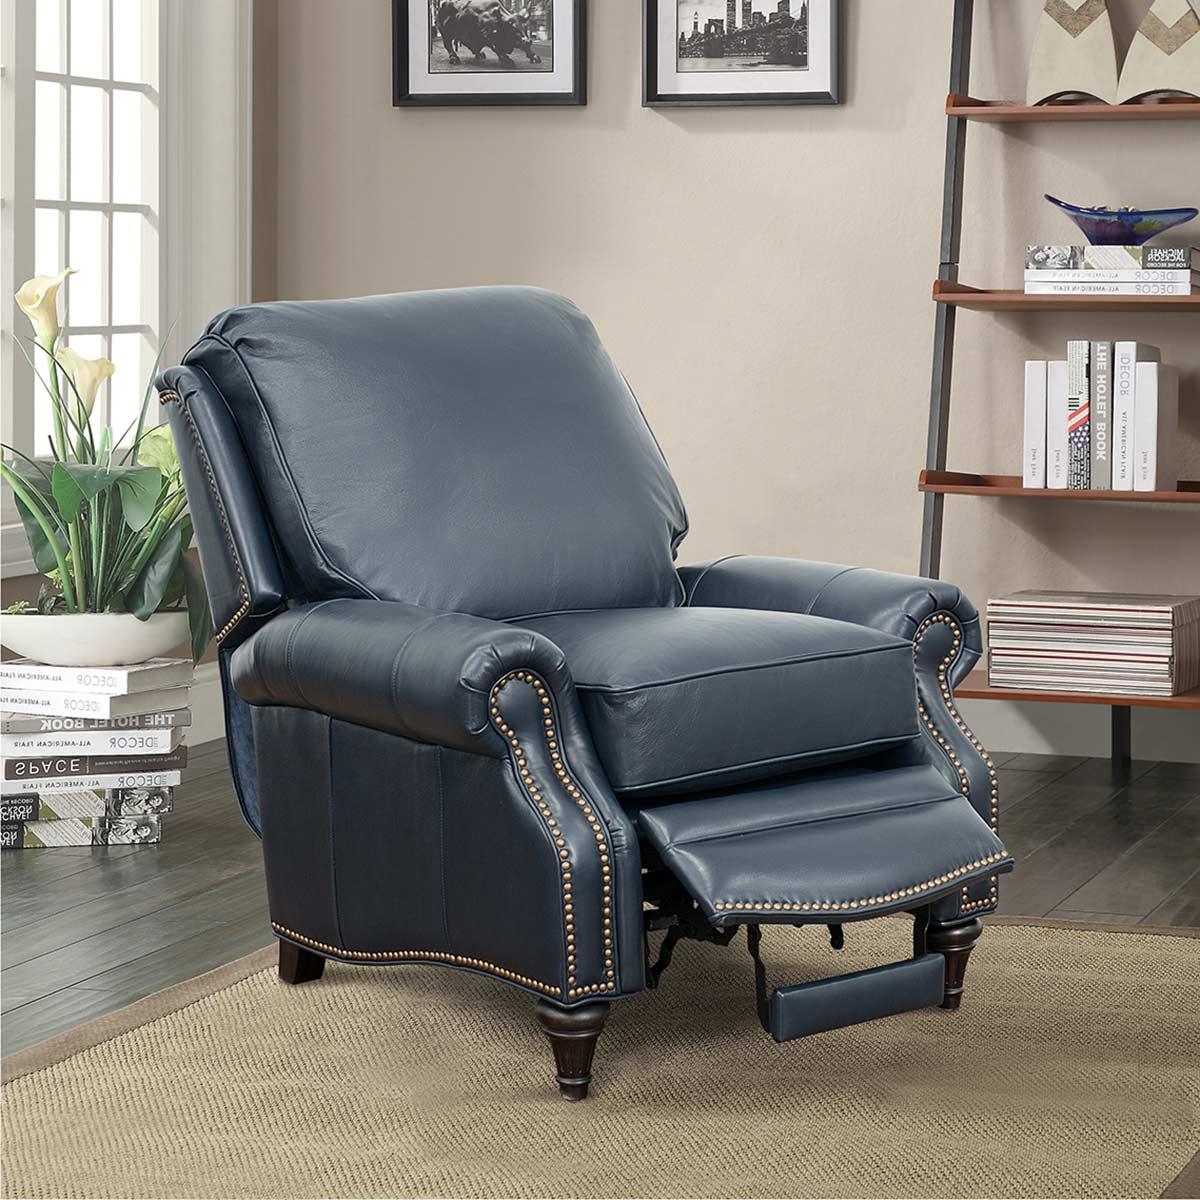 Barcalounger Avery Recliner Chair - Shoreham Blue/All Leather